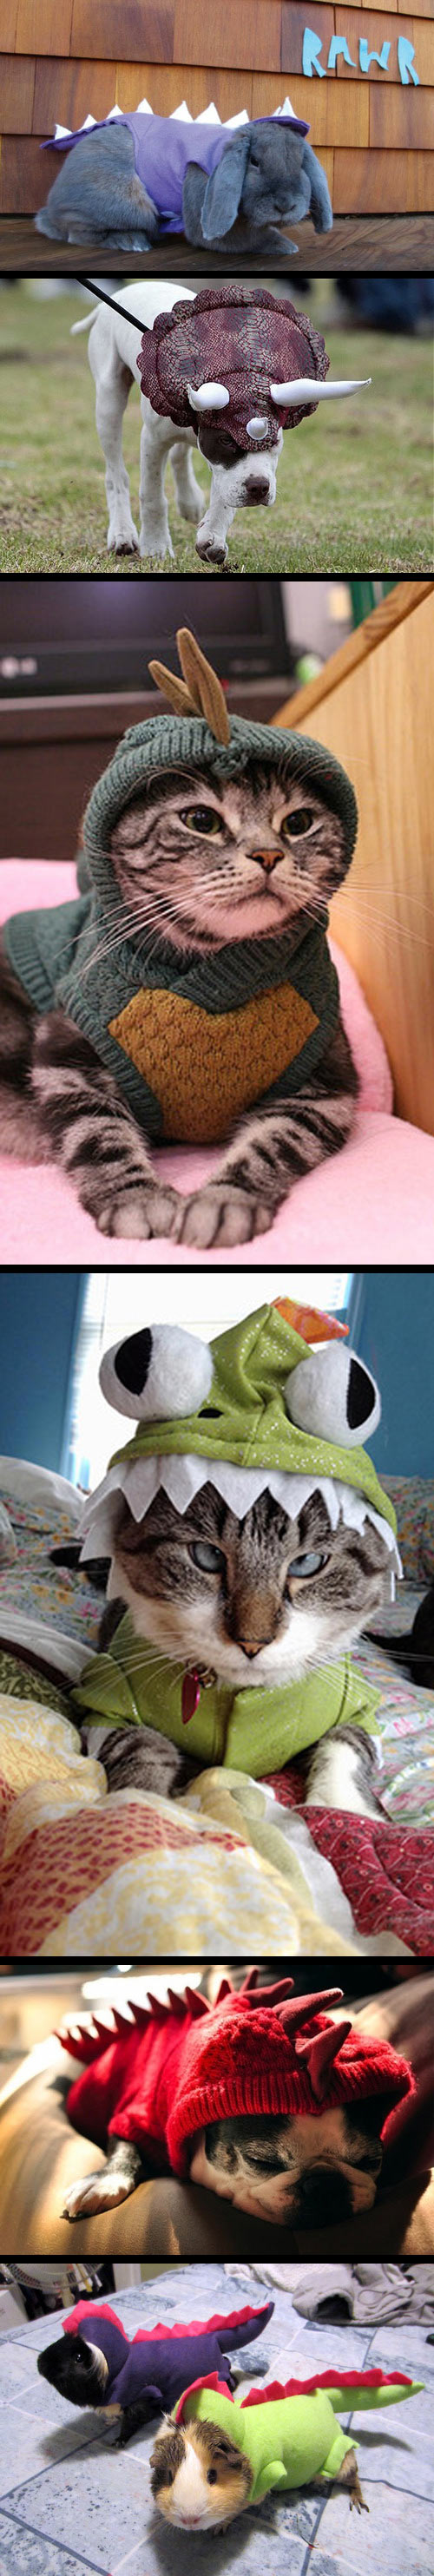 funny-animals-dinosaur-costumes-rabbit